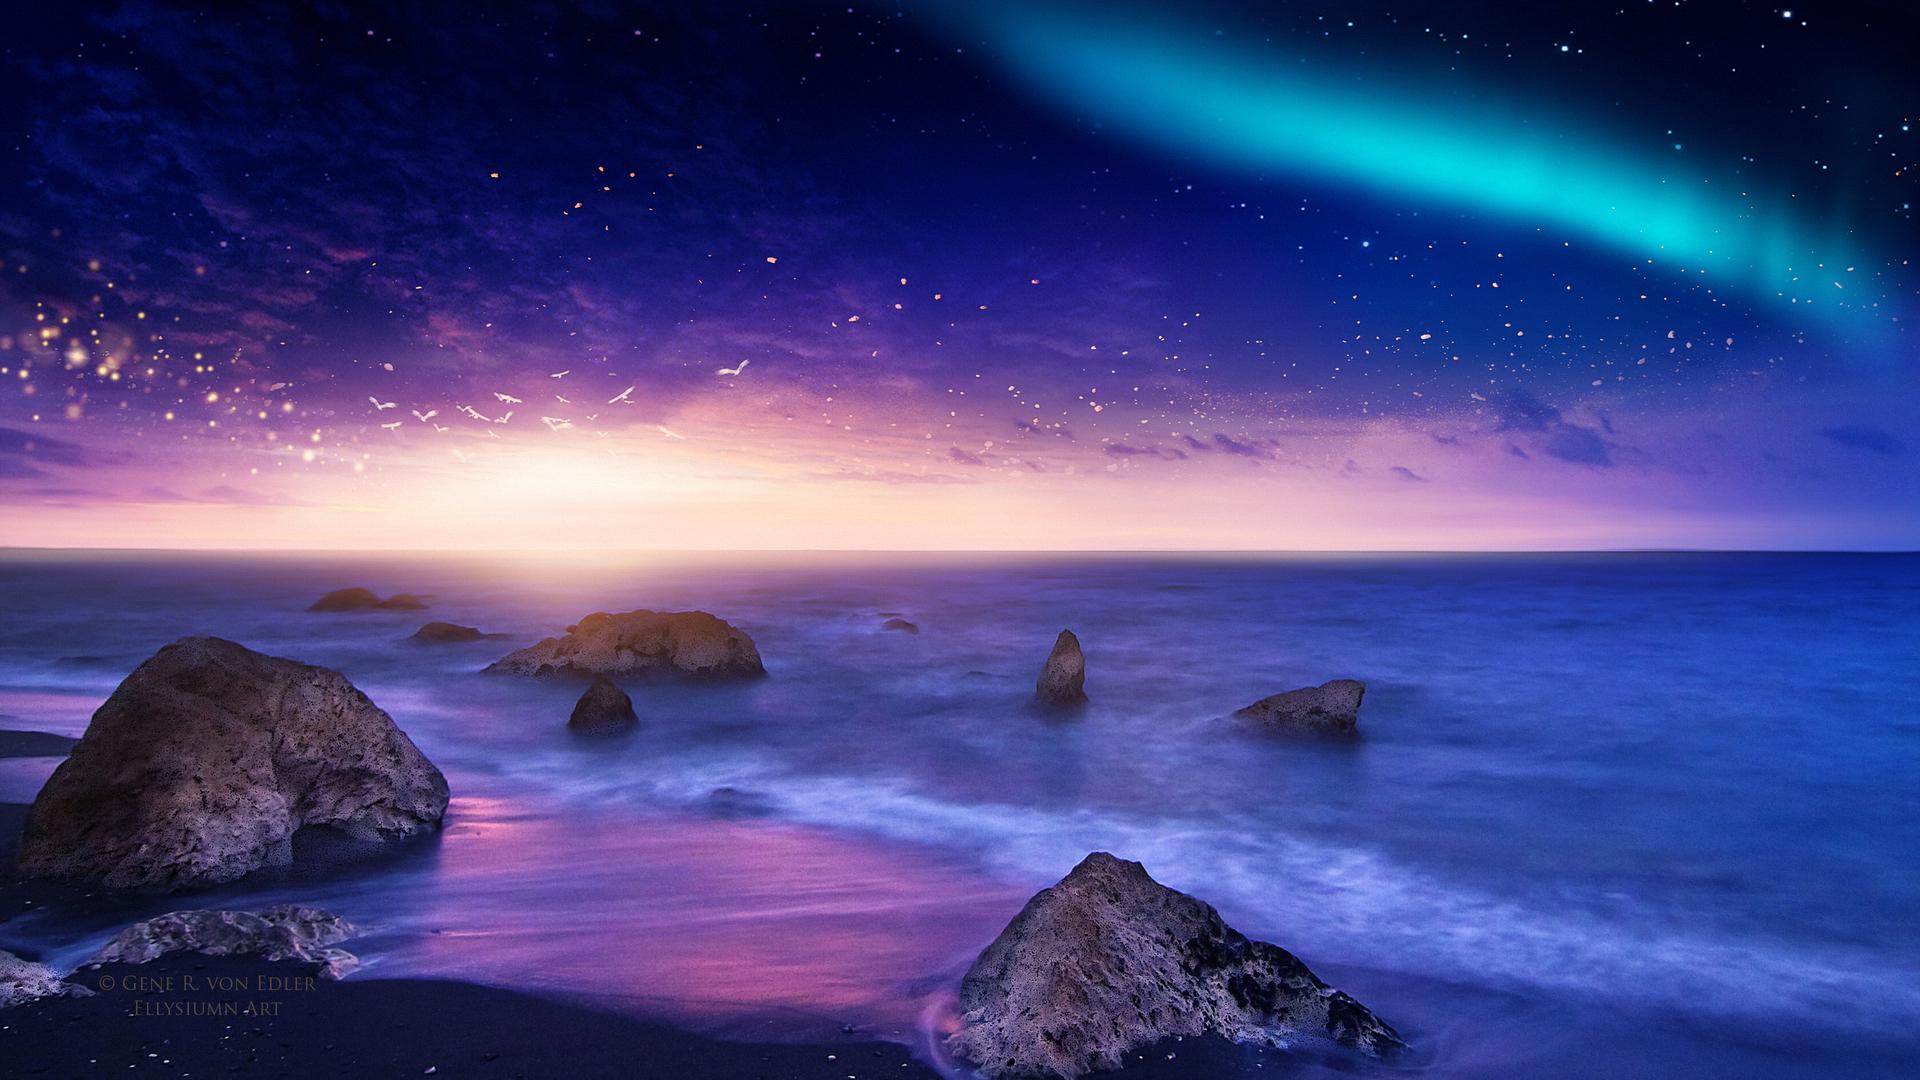 glowing-sunset-4k-c7.jpg